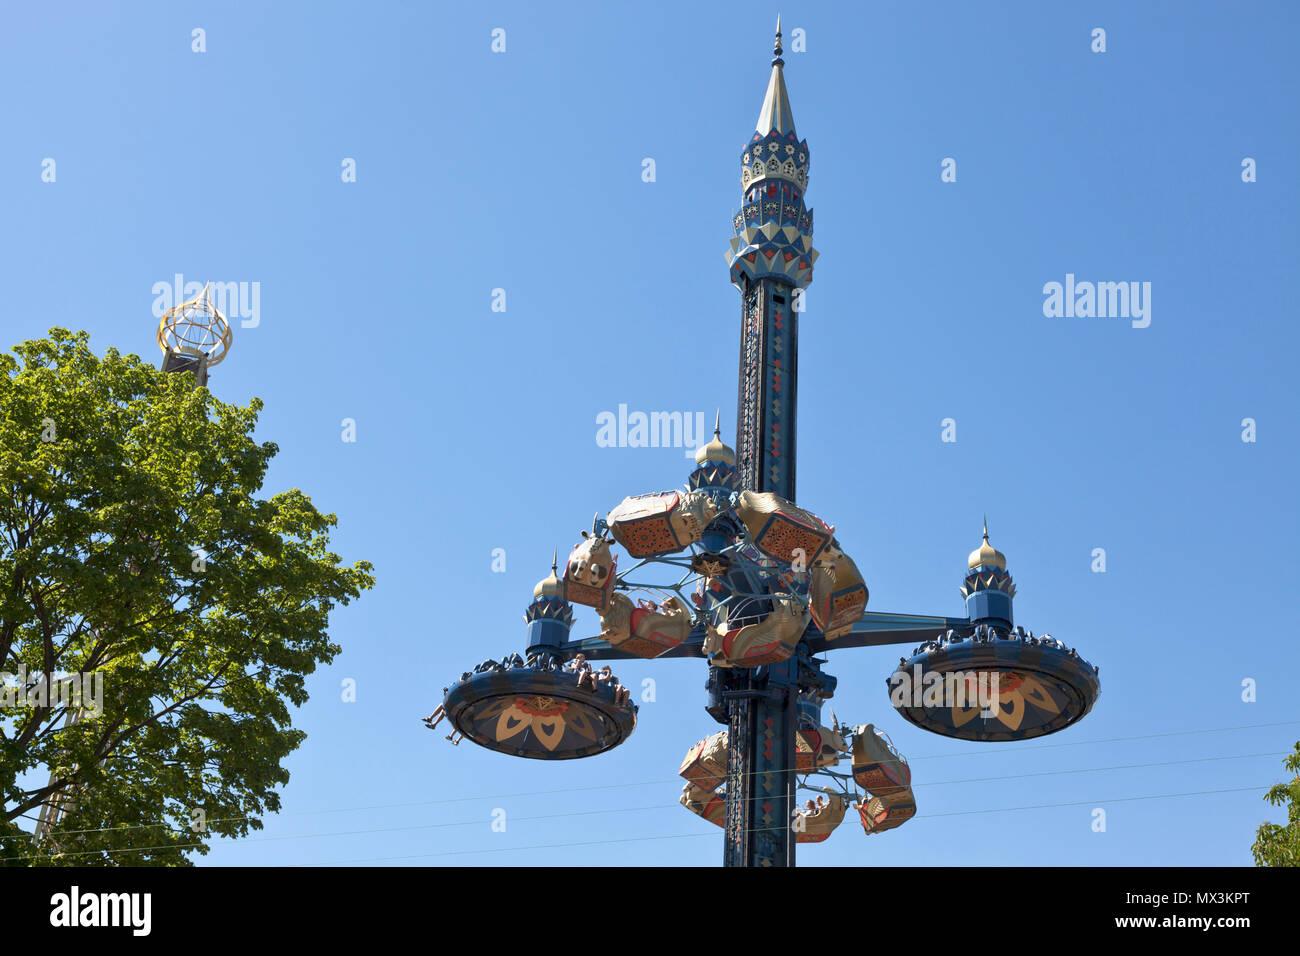 The Fatamorgana ride in the Tivoli Gardens, Copenhagen, Denmark, in early summer. Blue sky. Stock Photo